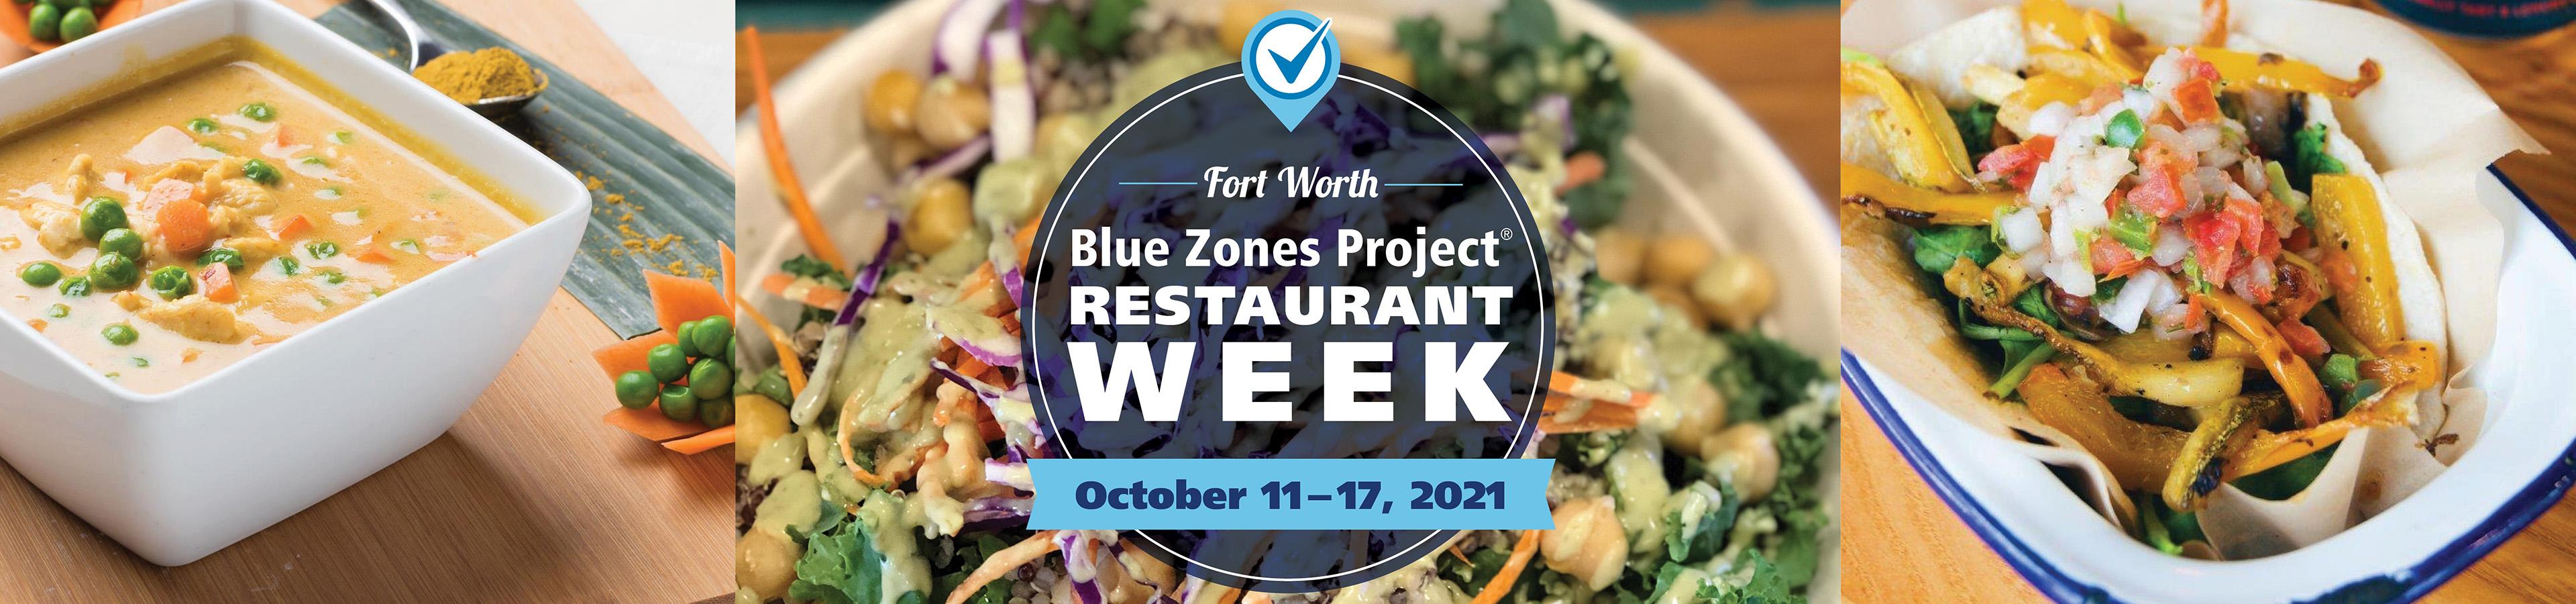 Fort Worth Blue Zones Project Restaurant Week: October 11-17, 2021